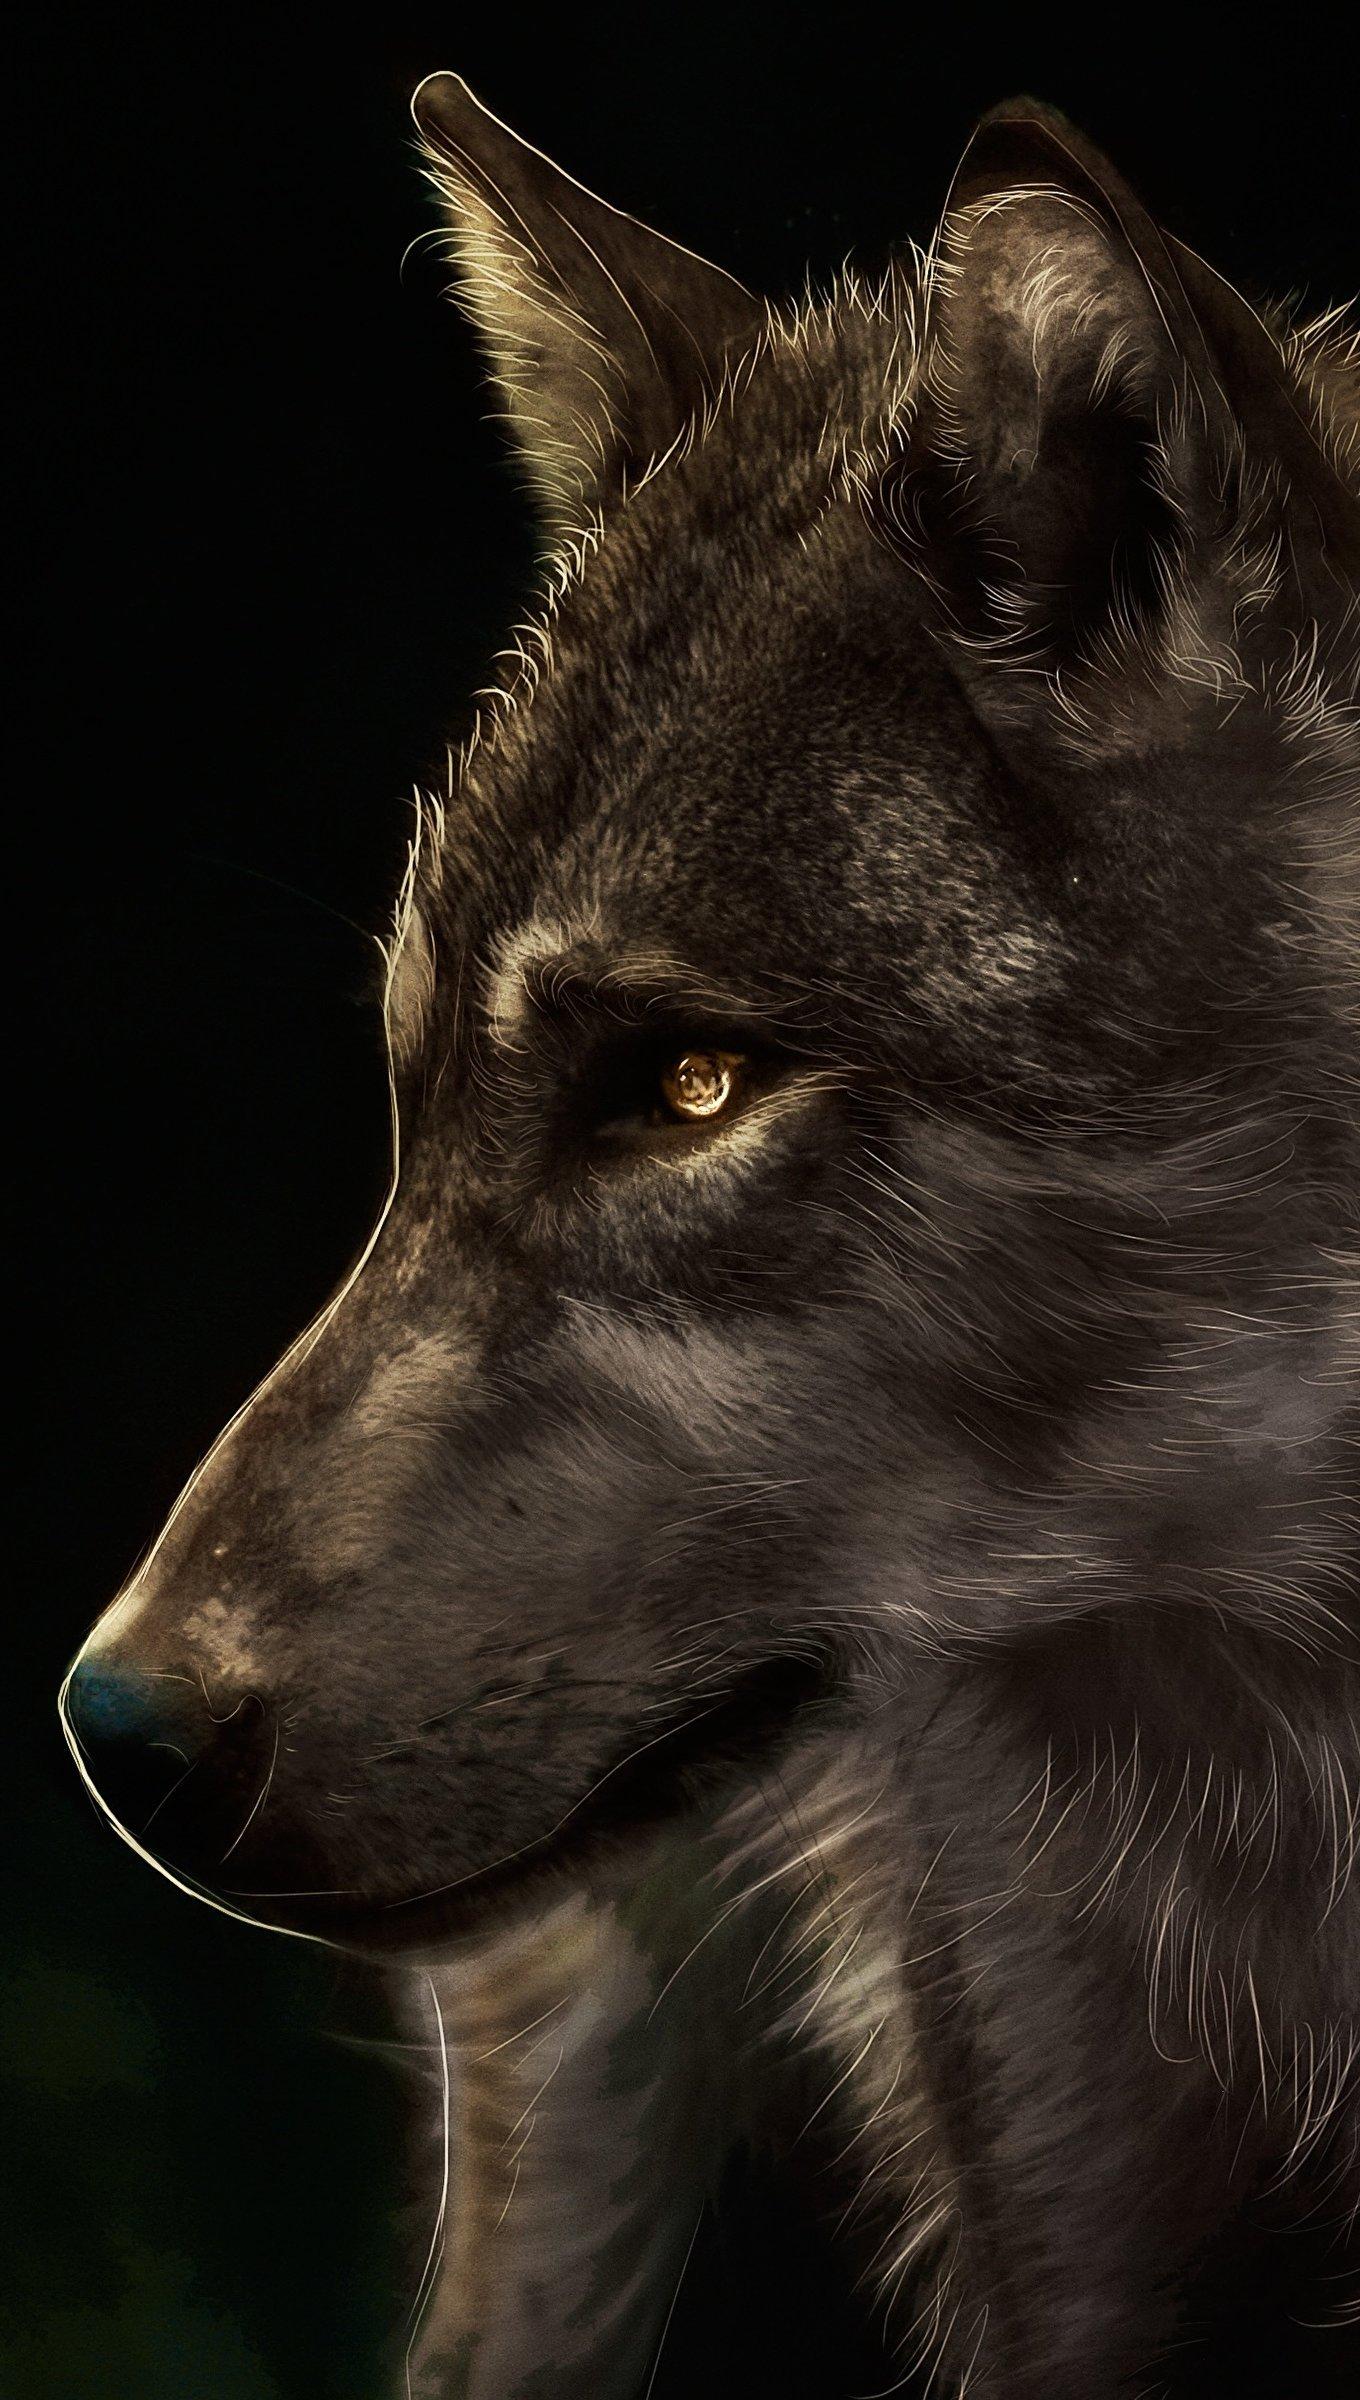 Fondos de pantalla Pintura de Lobo en fondo negro Vertical